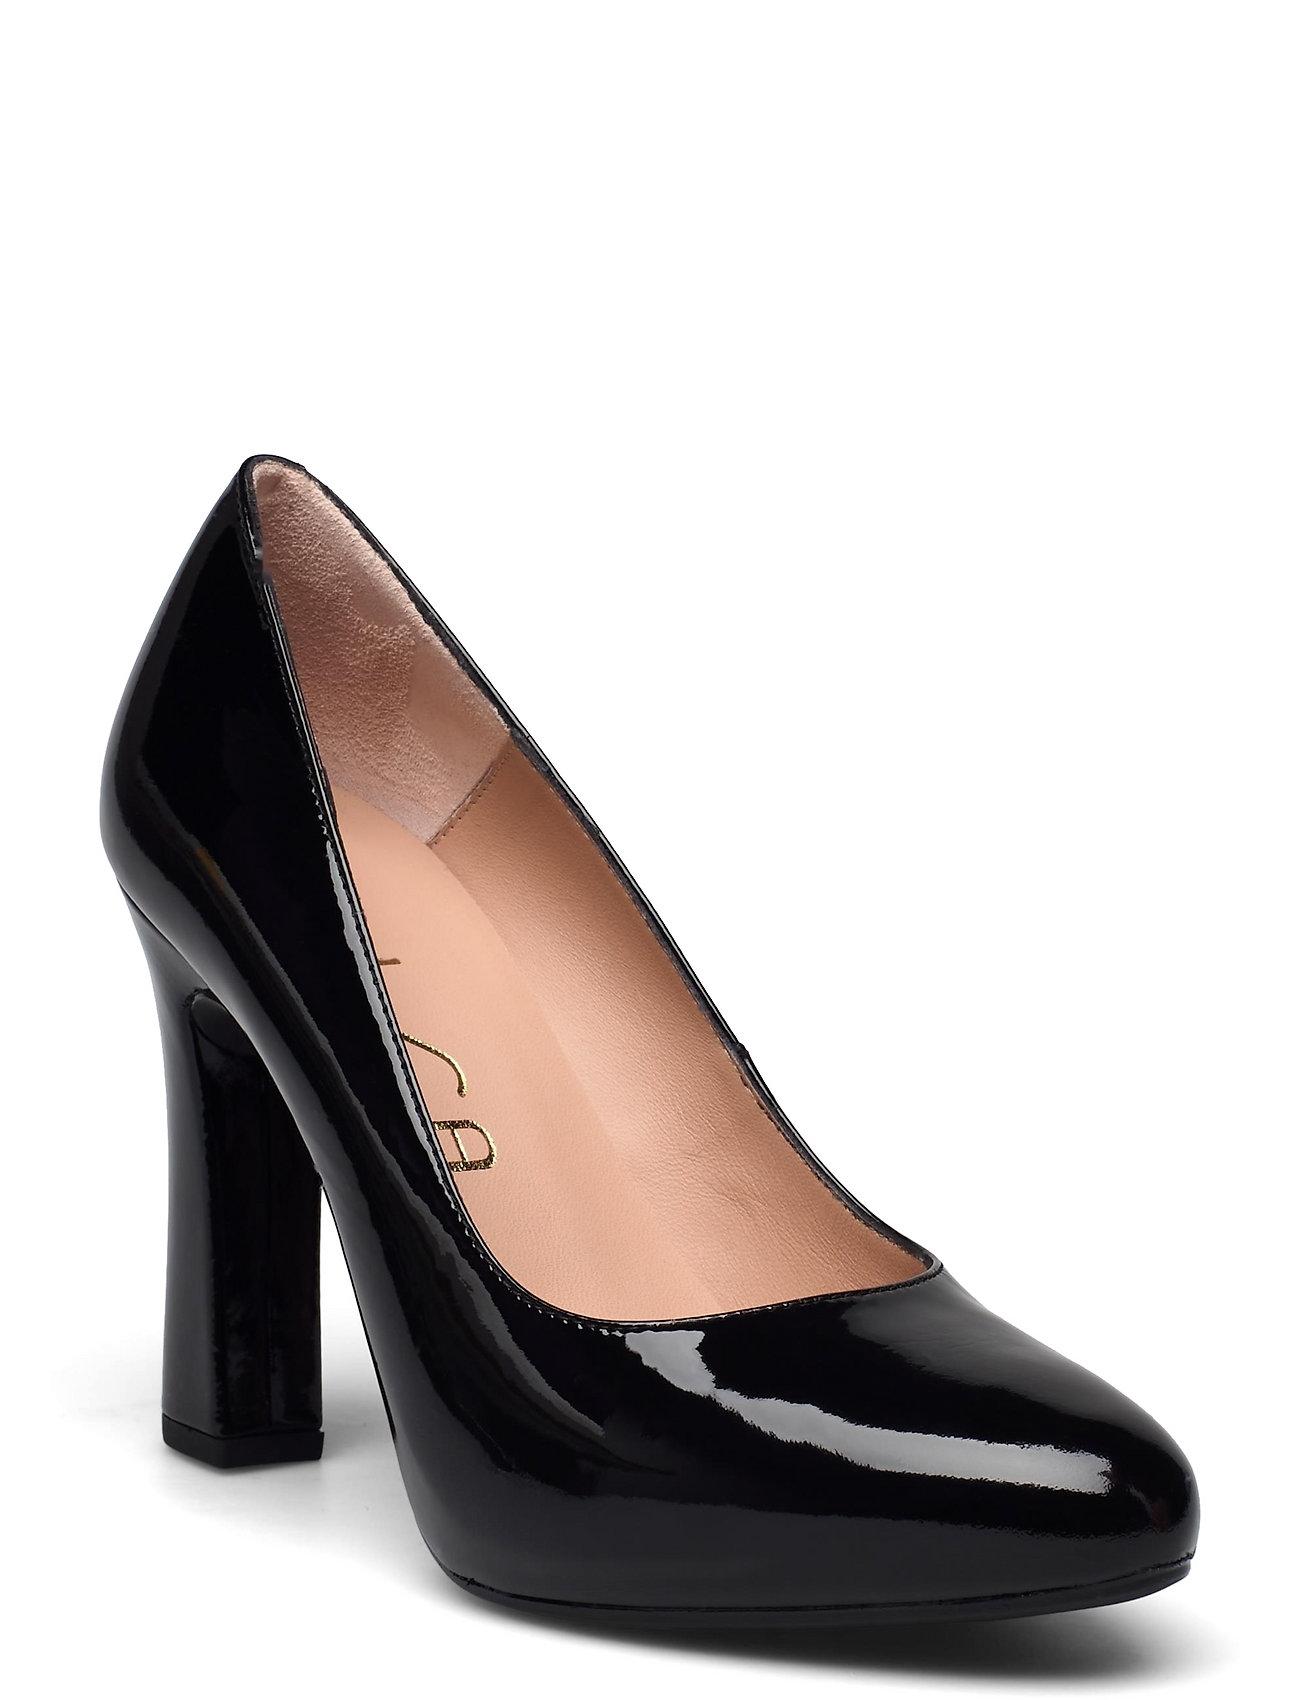 Patric_f21_pa Shoes Heels Pumps Classic Sort UNISA